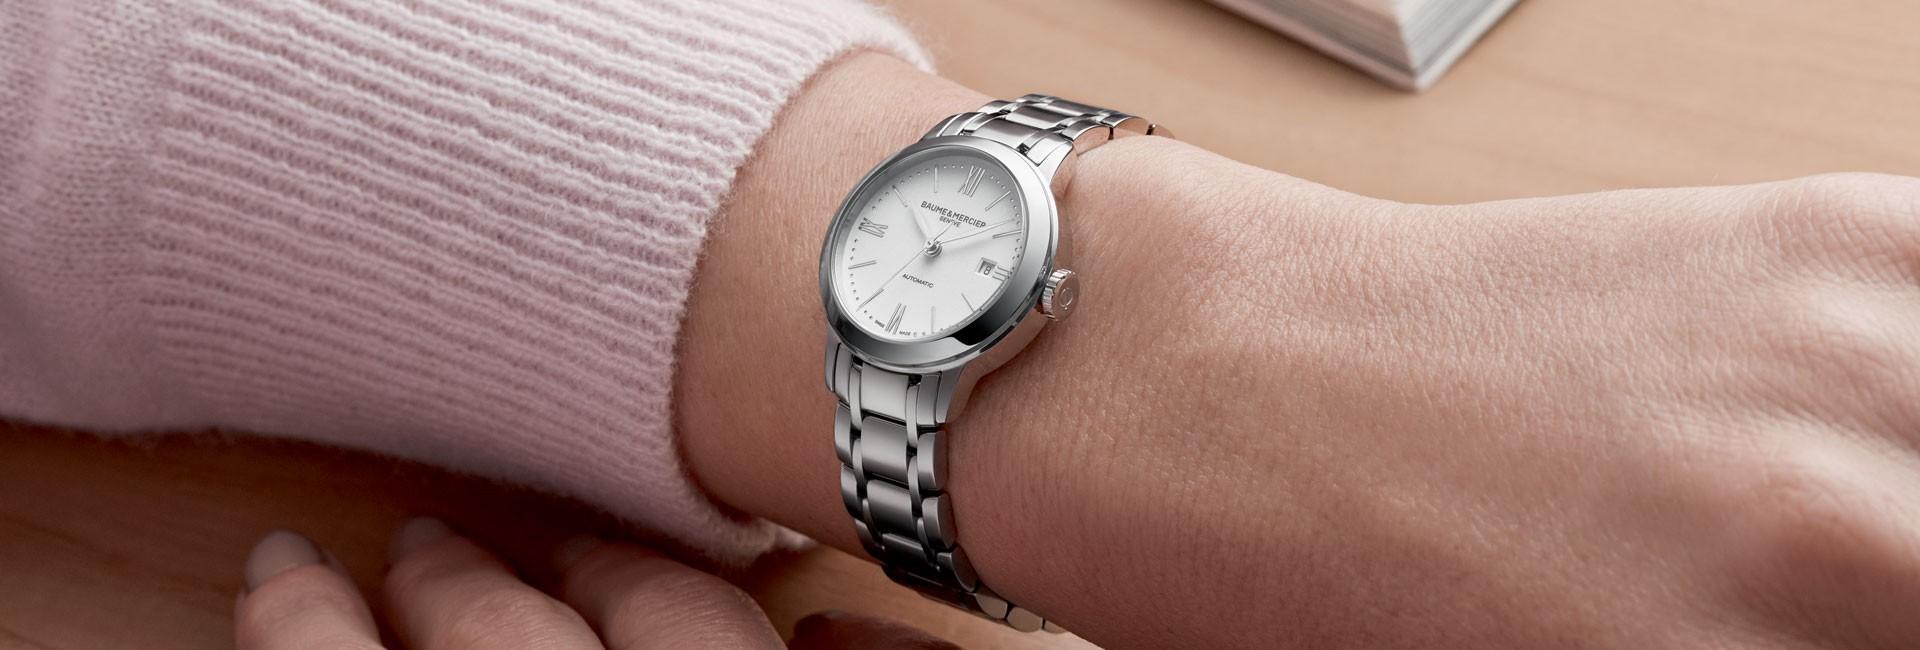 Classic lady's watch